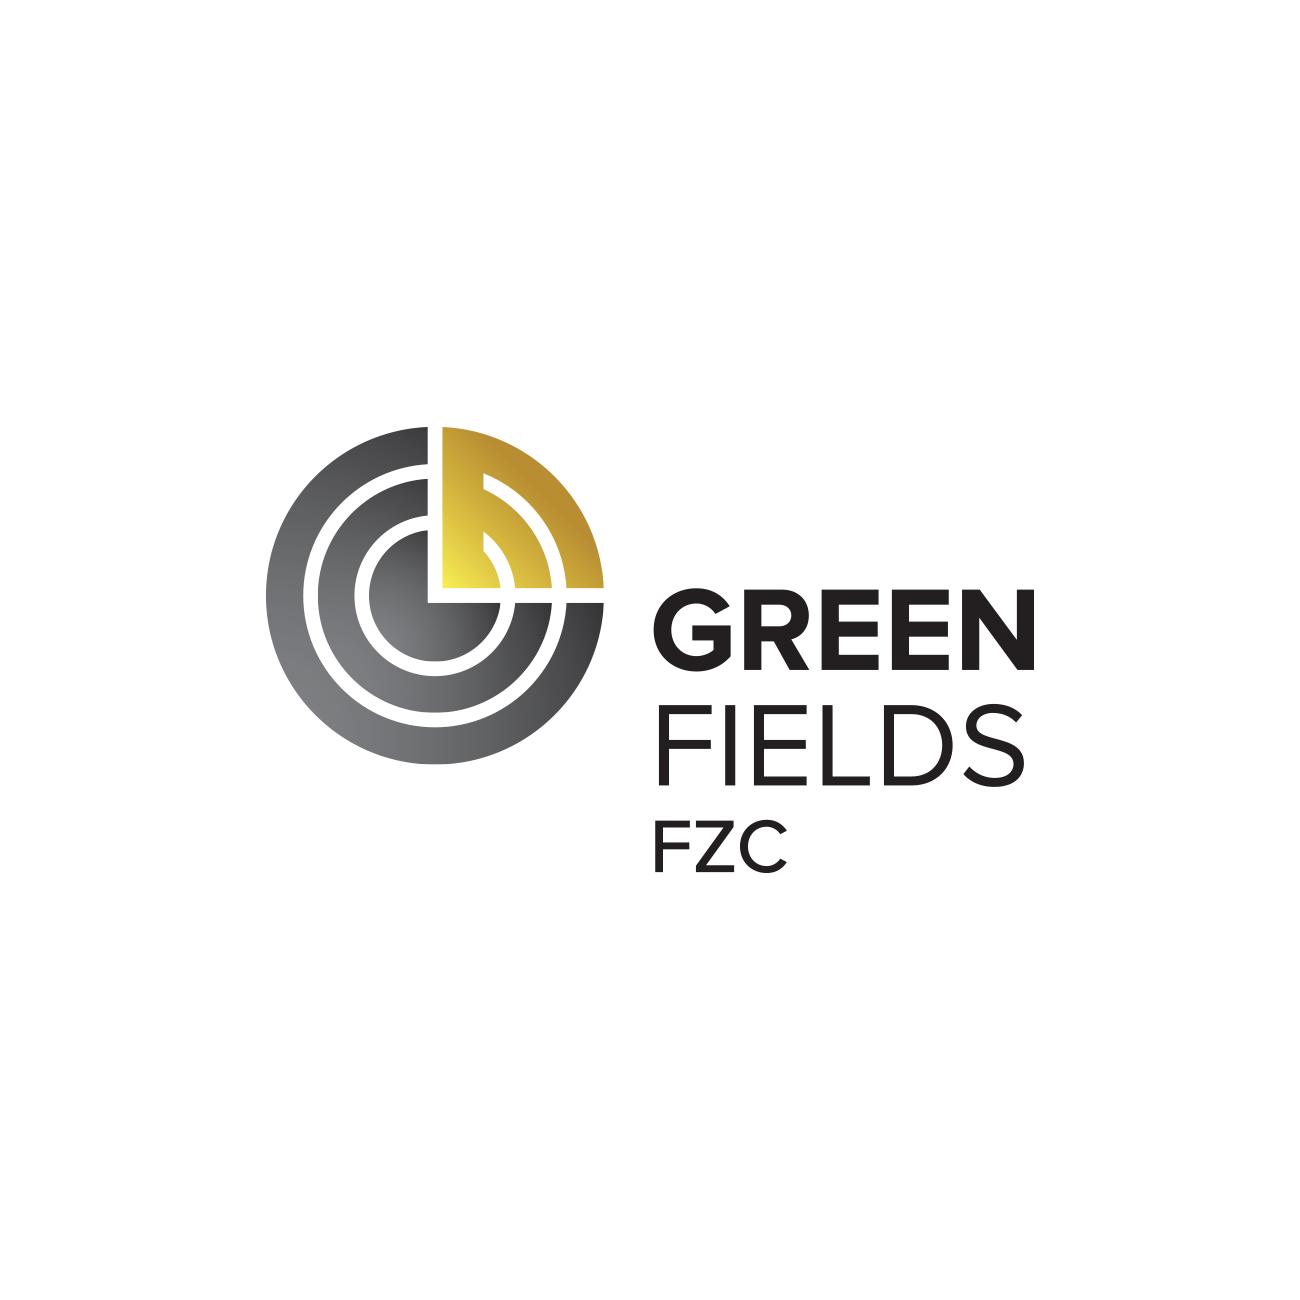 Logotipo greenfields